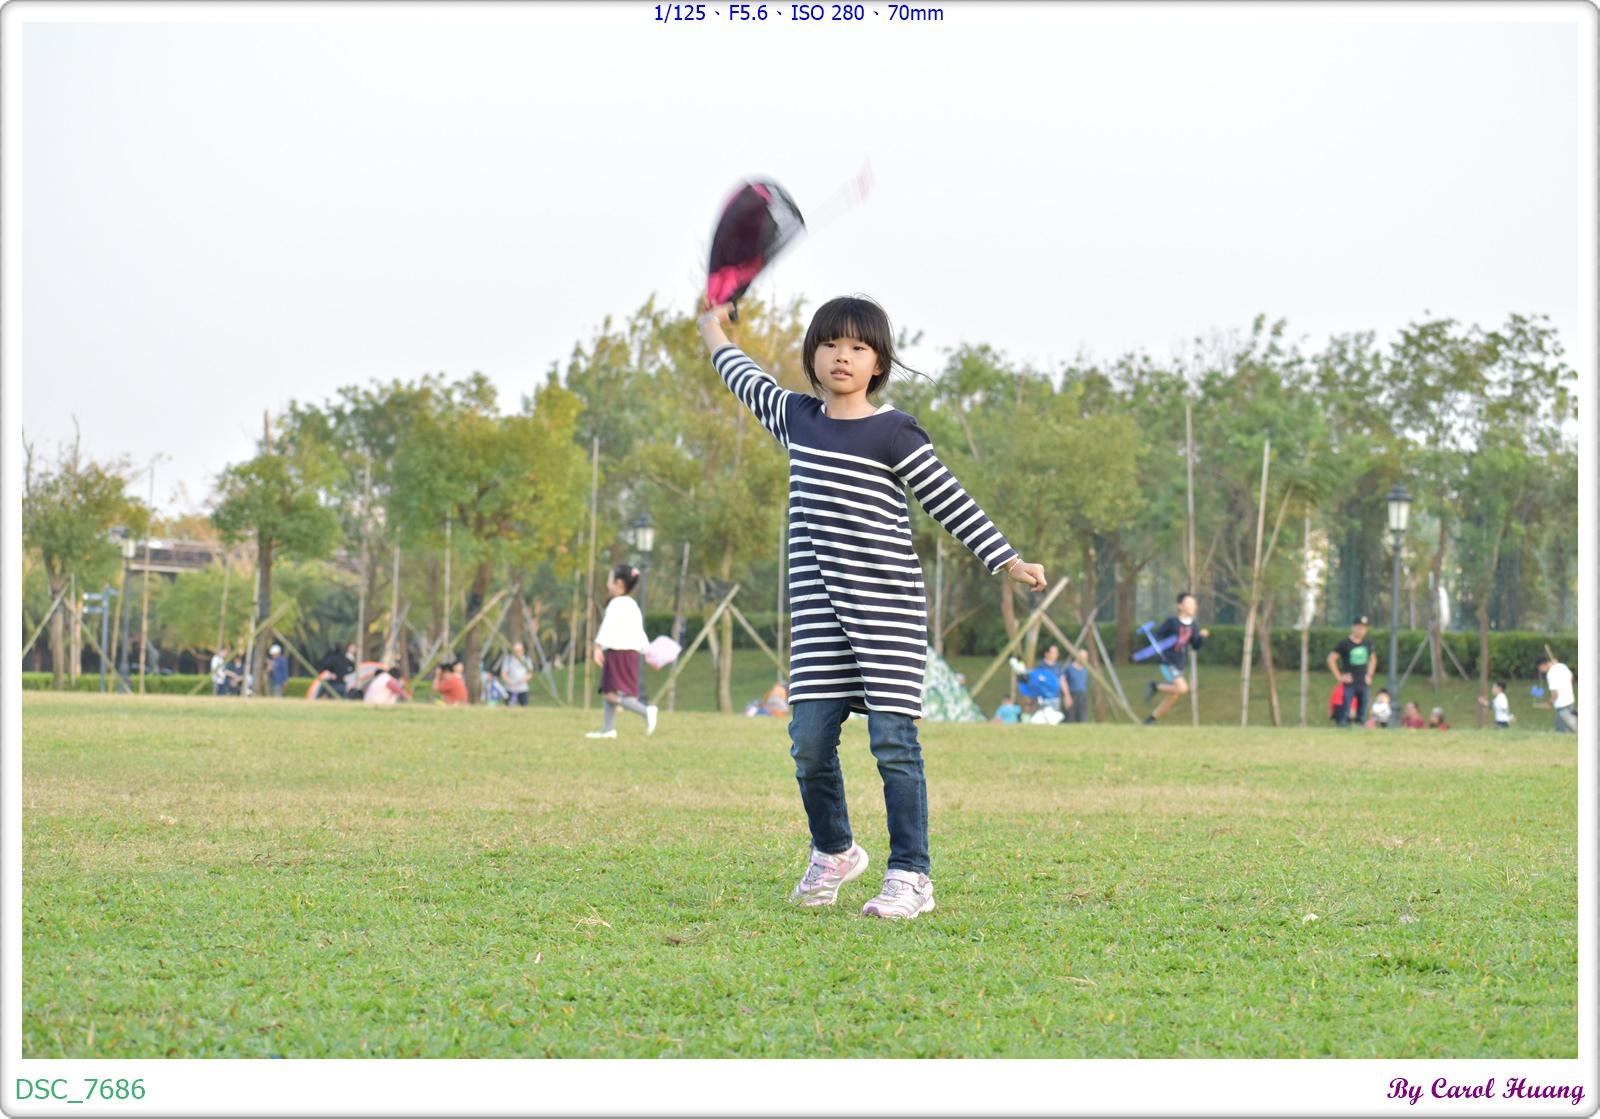 DSC_7686.JPG